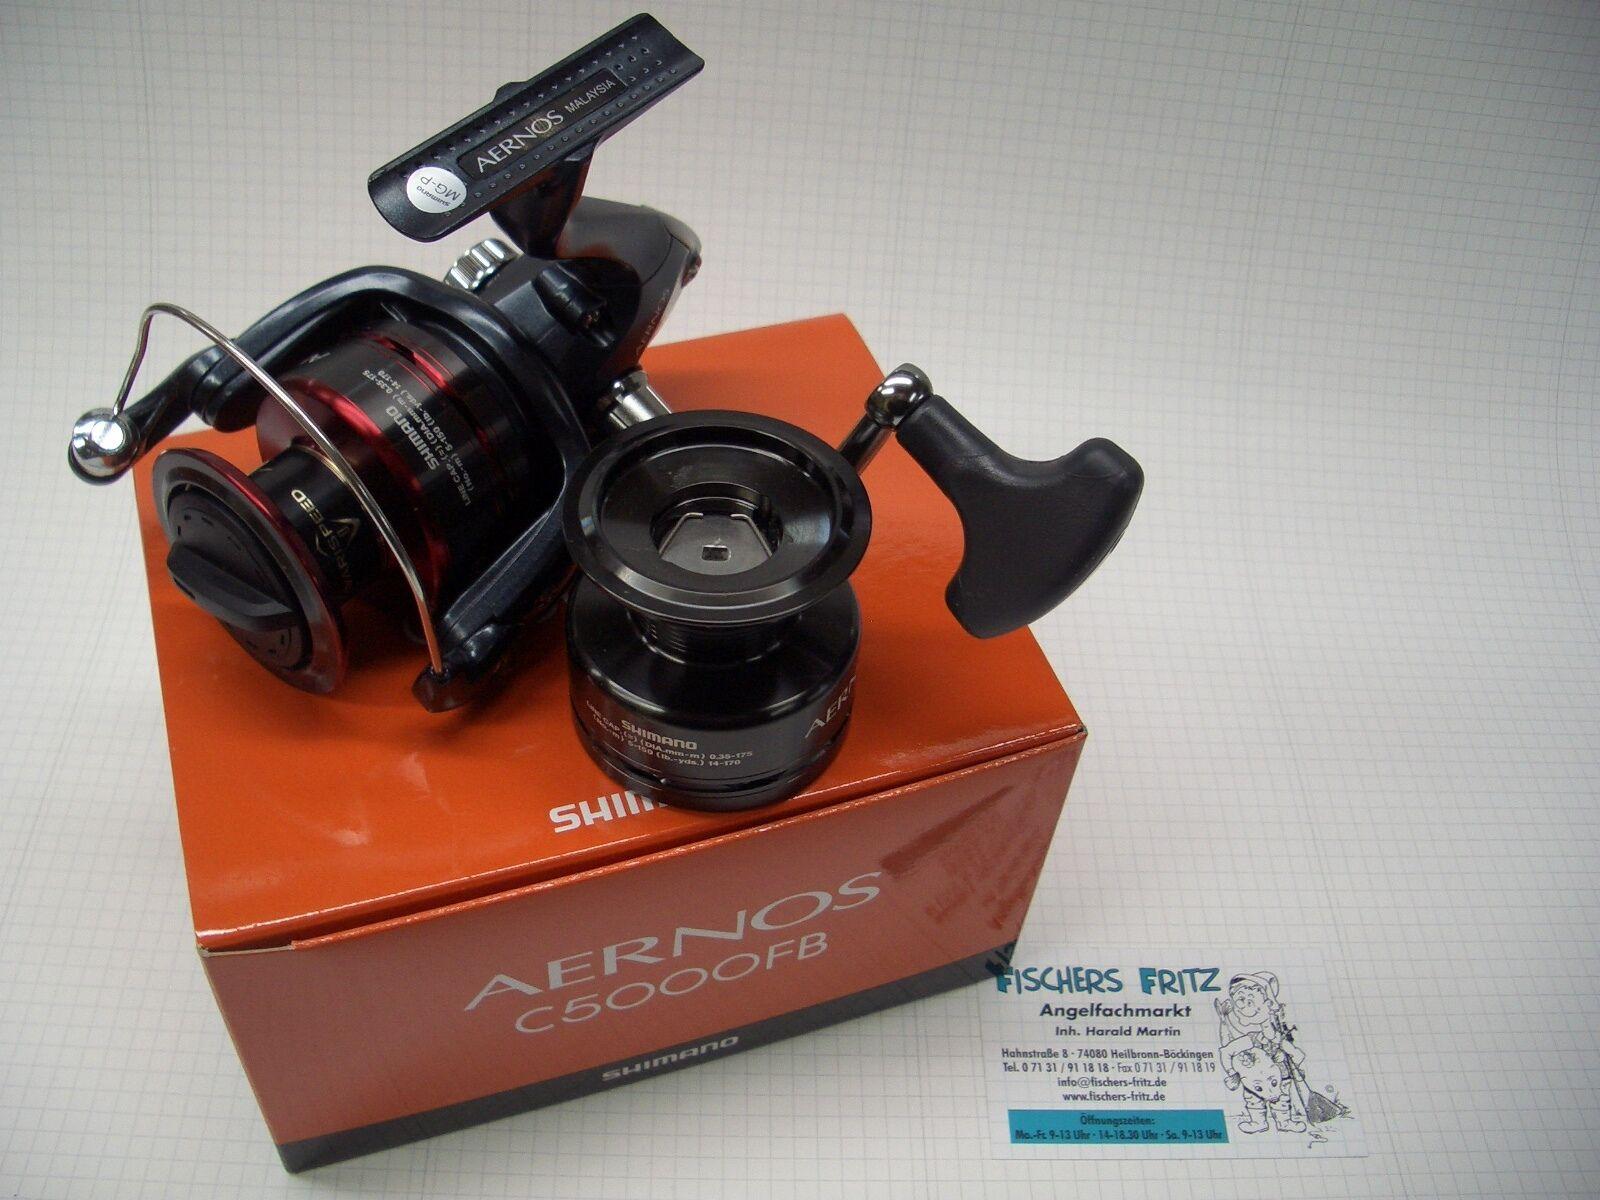 Shimano Aernos C 5000FB  neu inkl. Ersatzspule Frontbremse Rolle Angelrolle